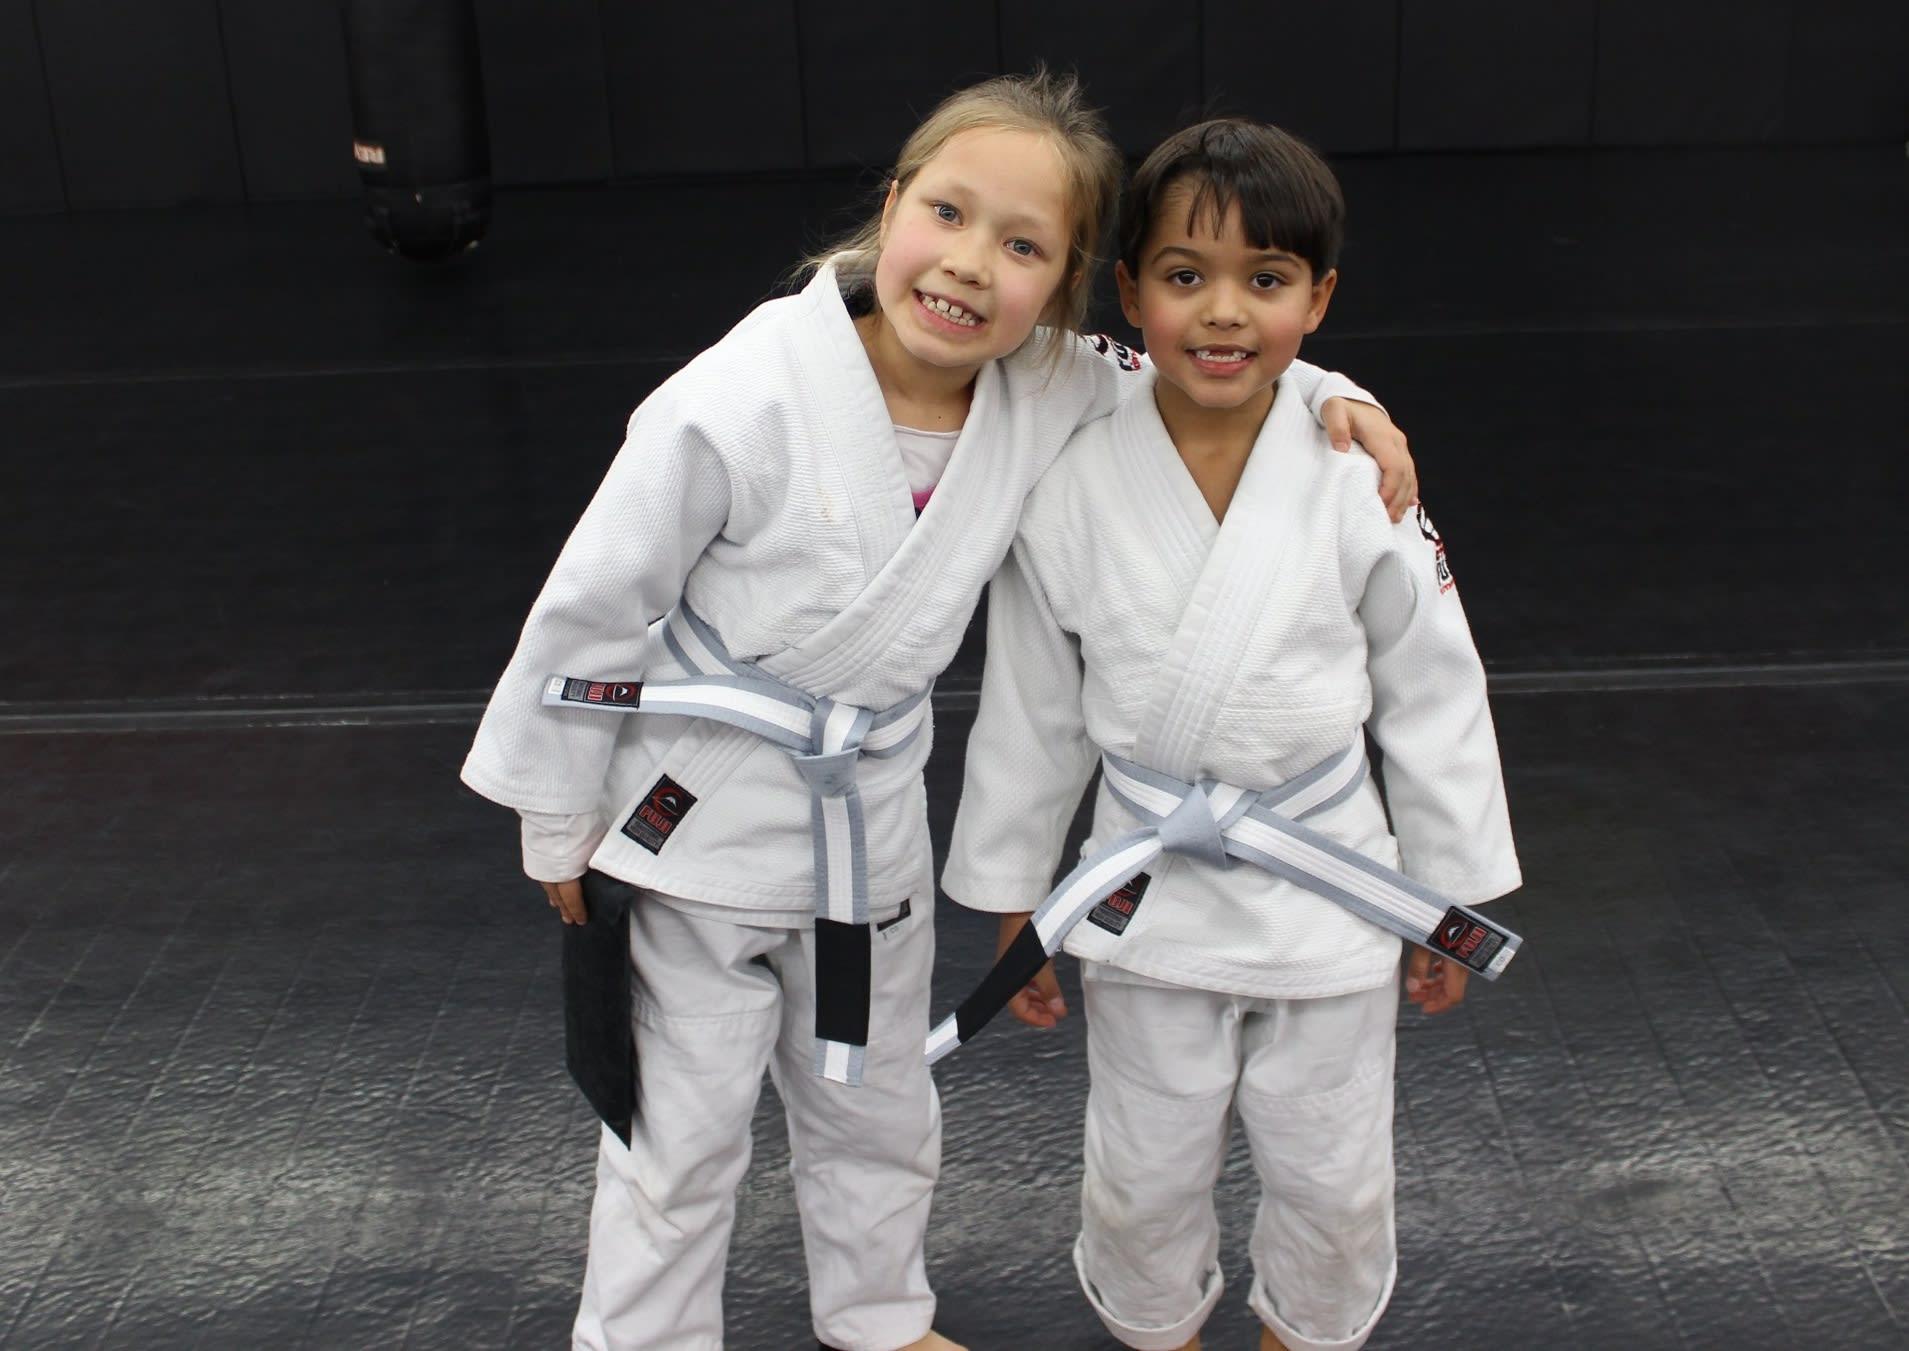 Athens Kids Martial Arts